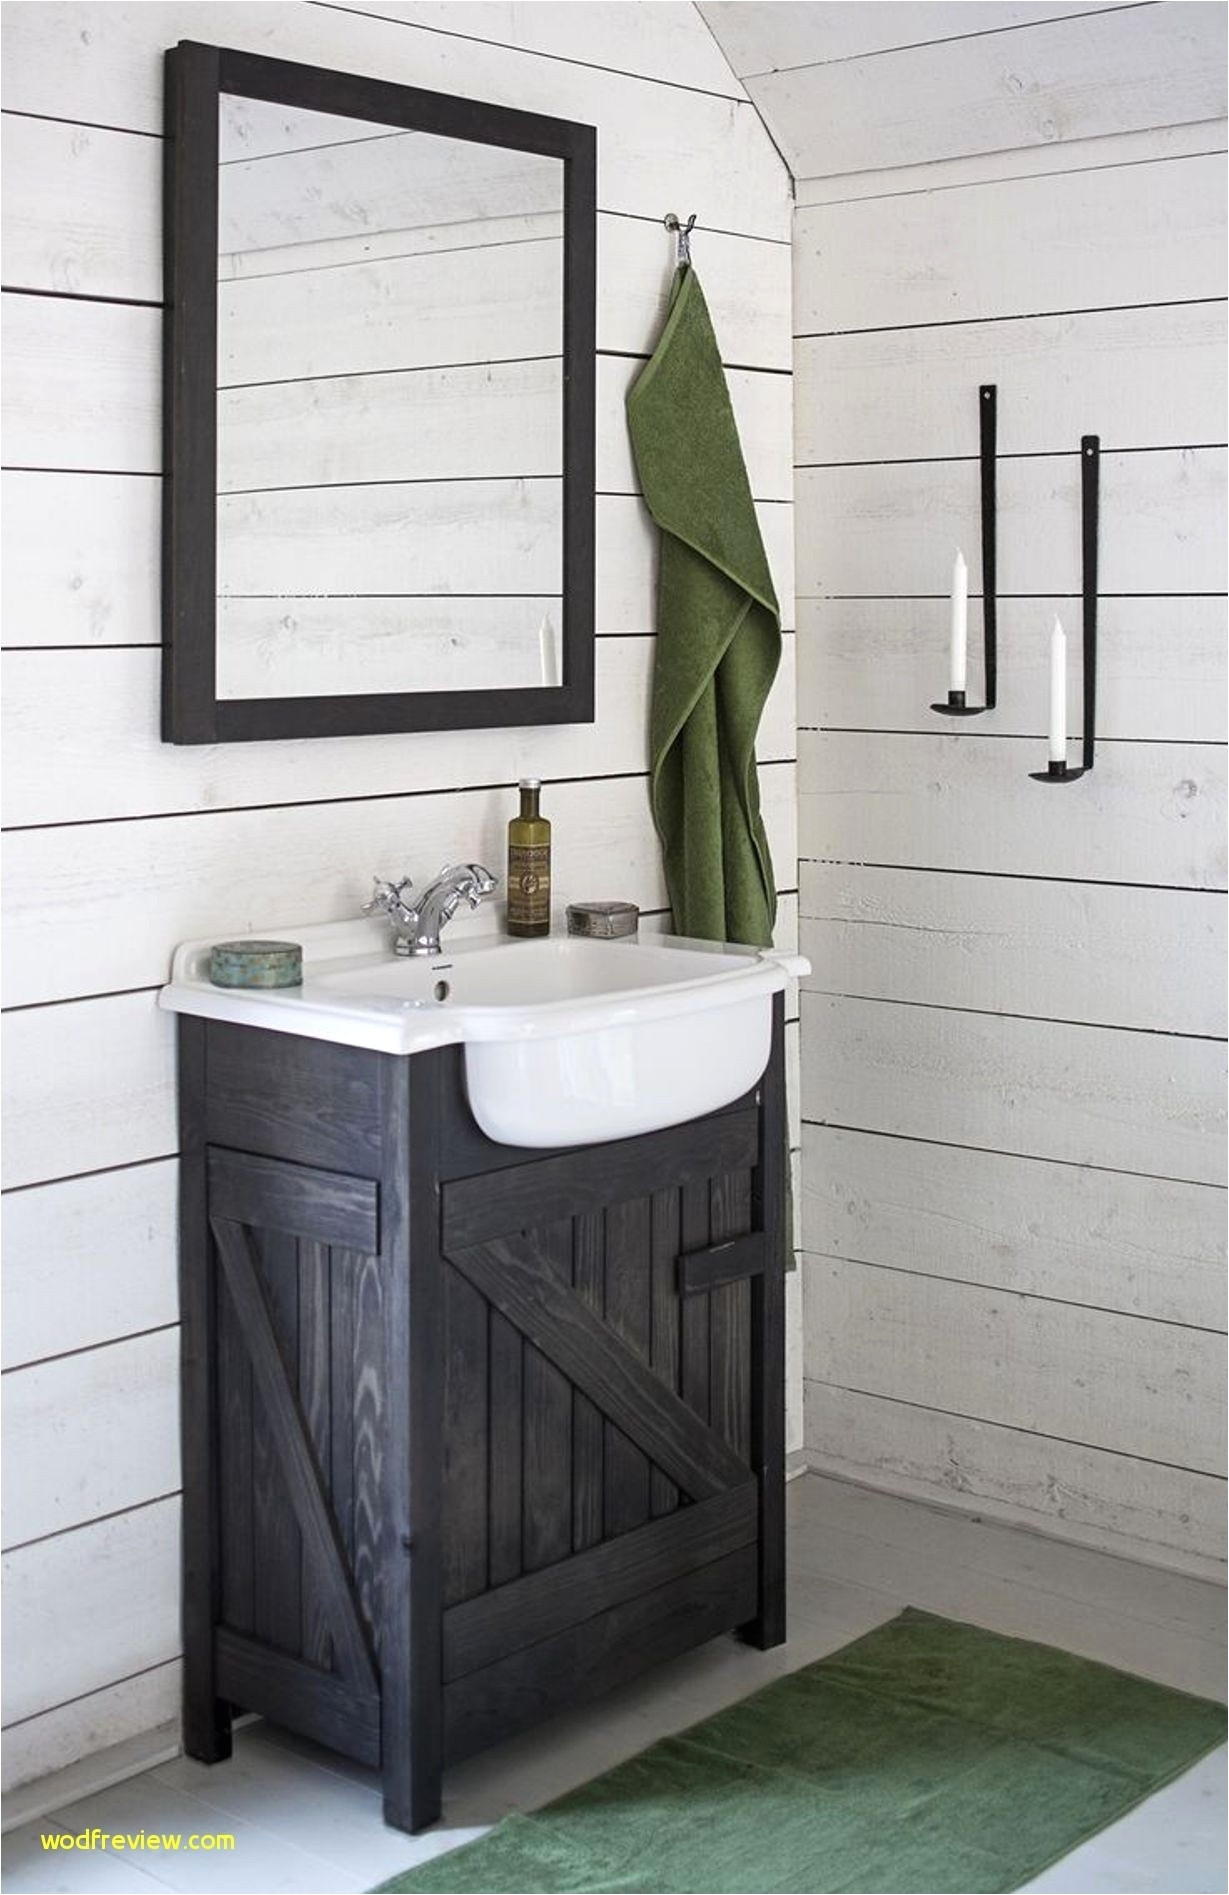 Bathroom Design Ideas Pictures Girls Bathroom Design New Inspirational Bathroom Picture Ideas